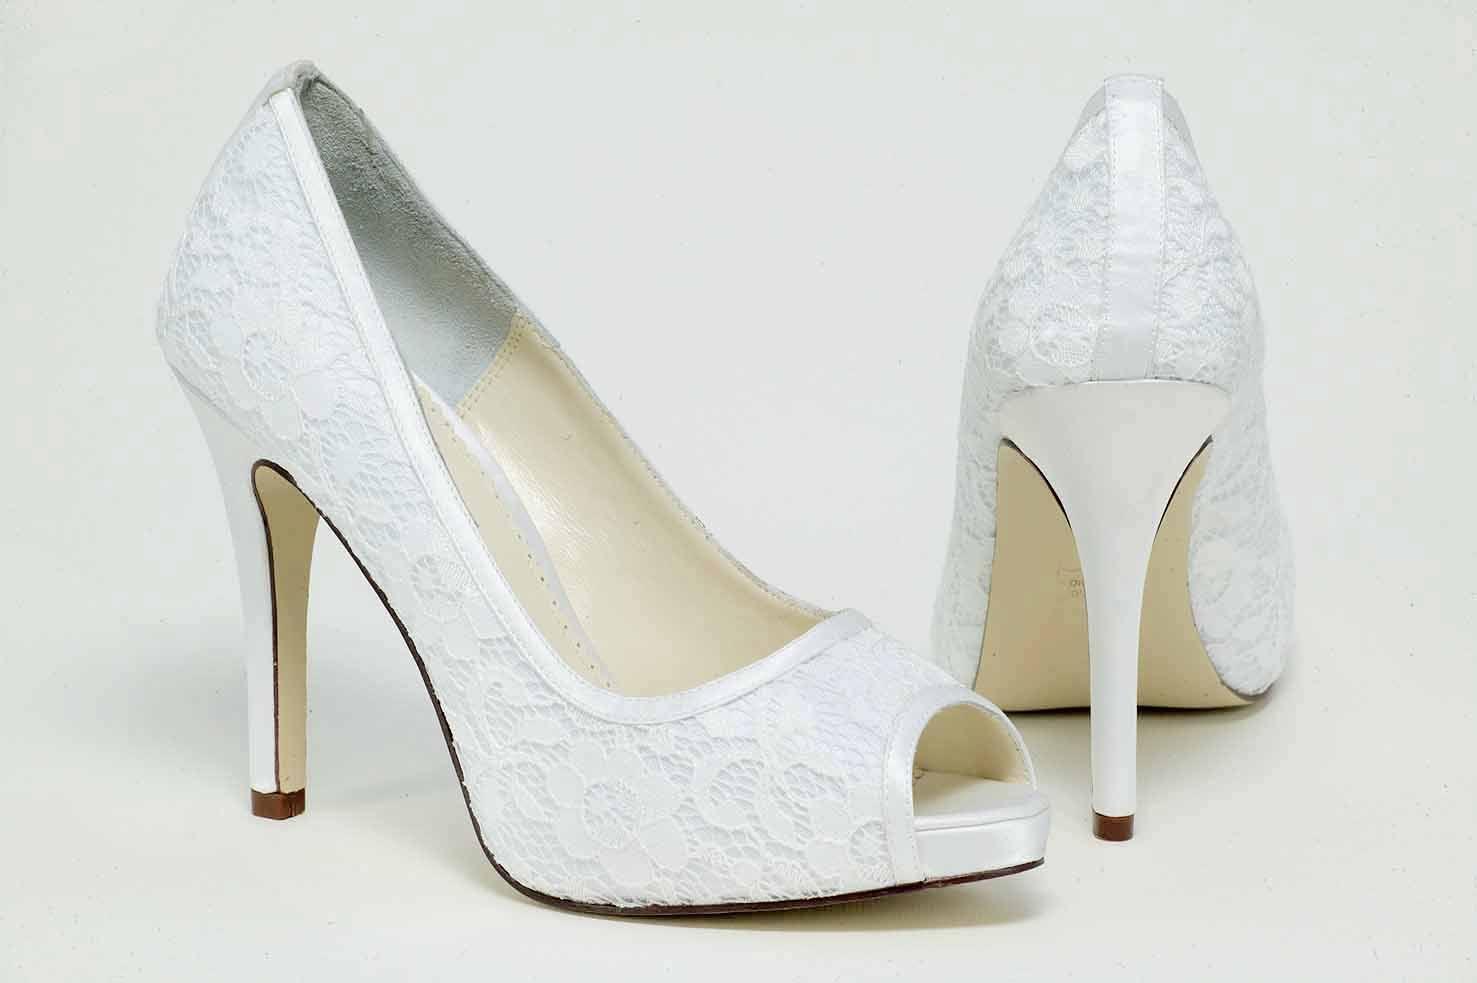 Wedding Shoes Platforms from Panache Bridal Shoes Sydney Melbourne Brisbane